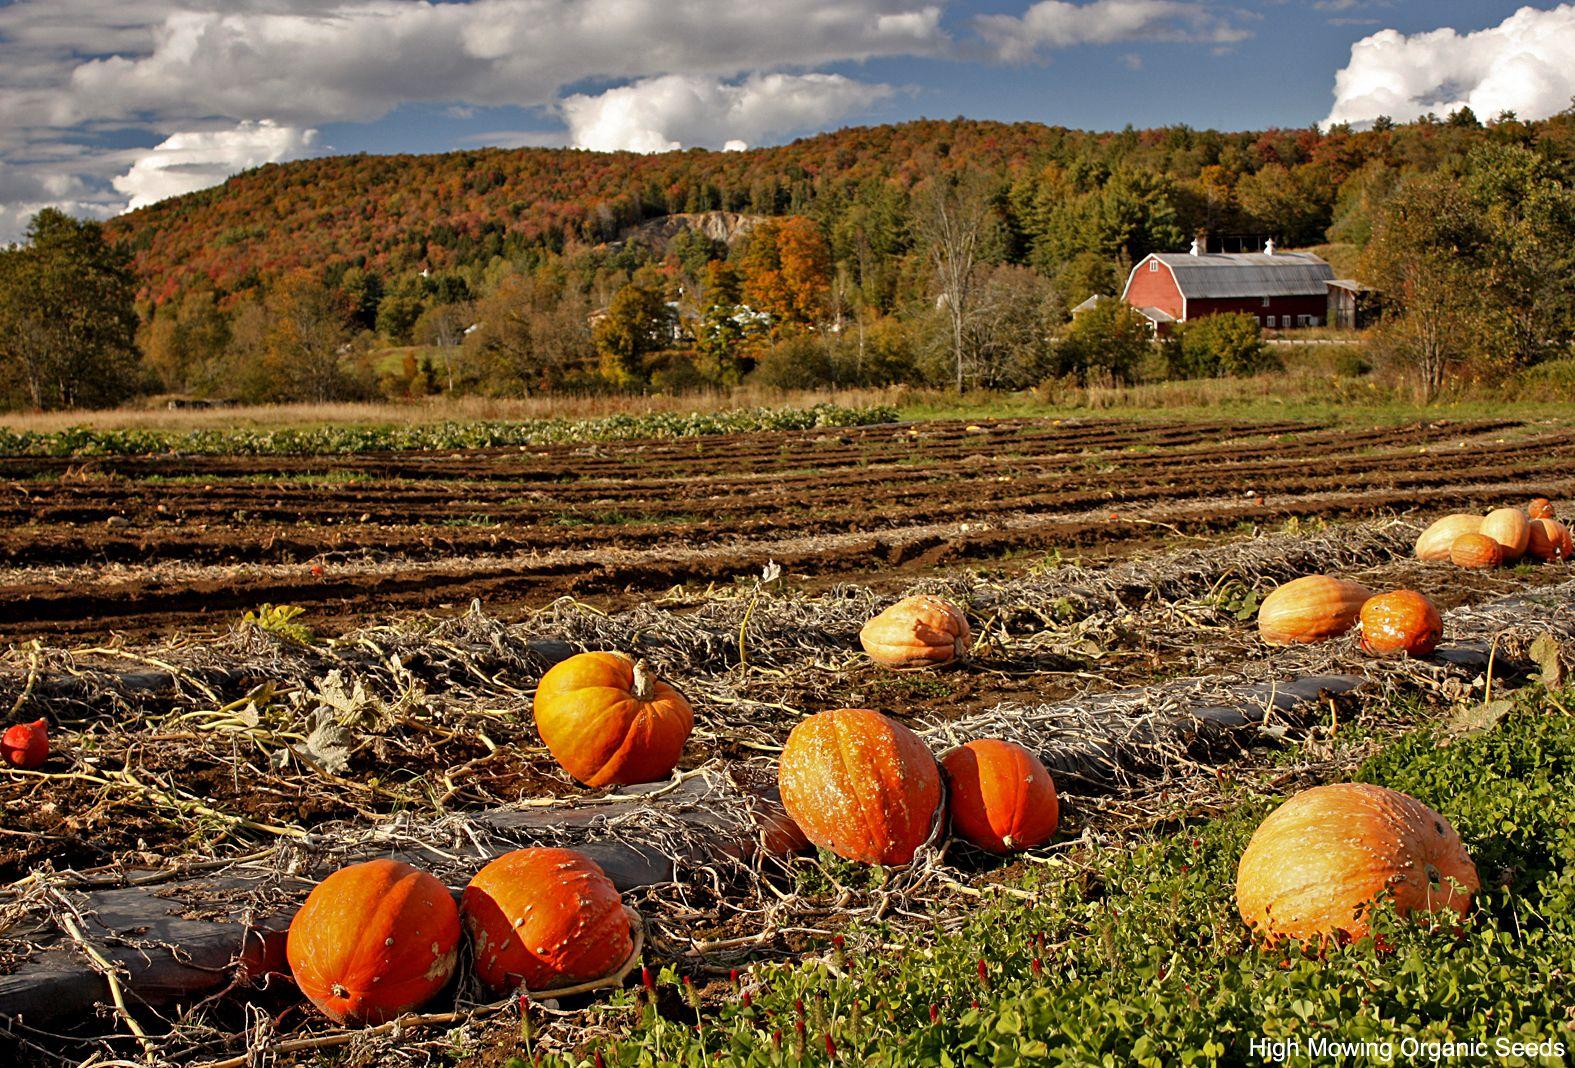 Organic Big Max pumpkins growing in the High Mowing